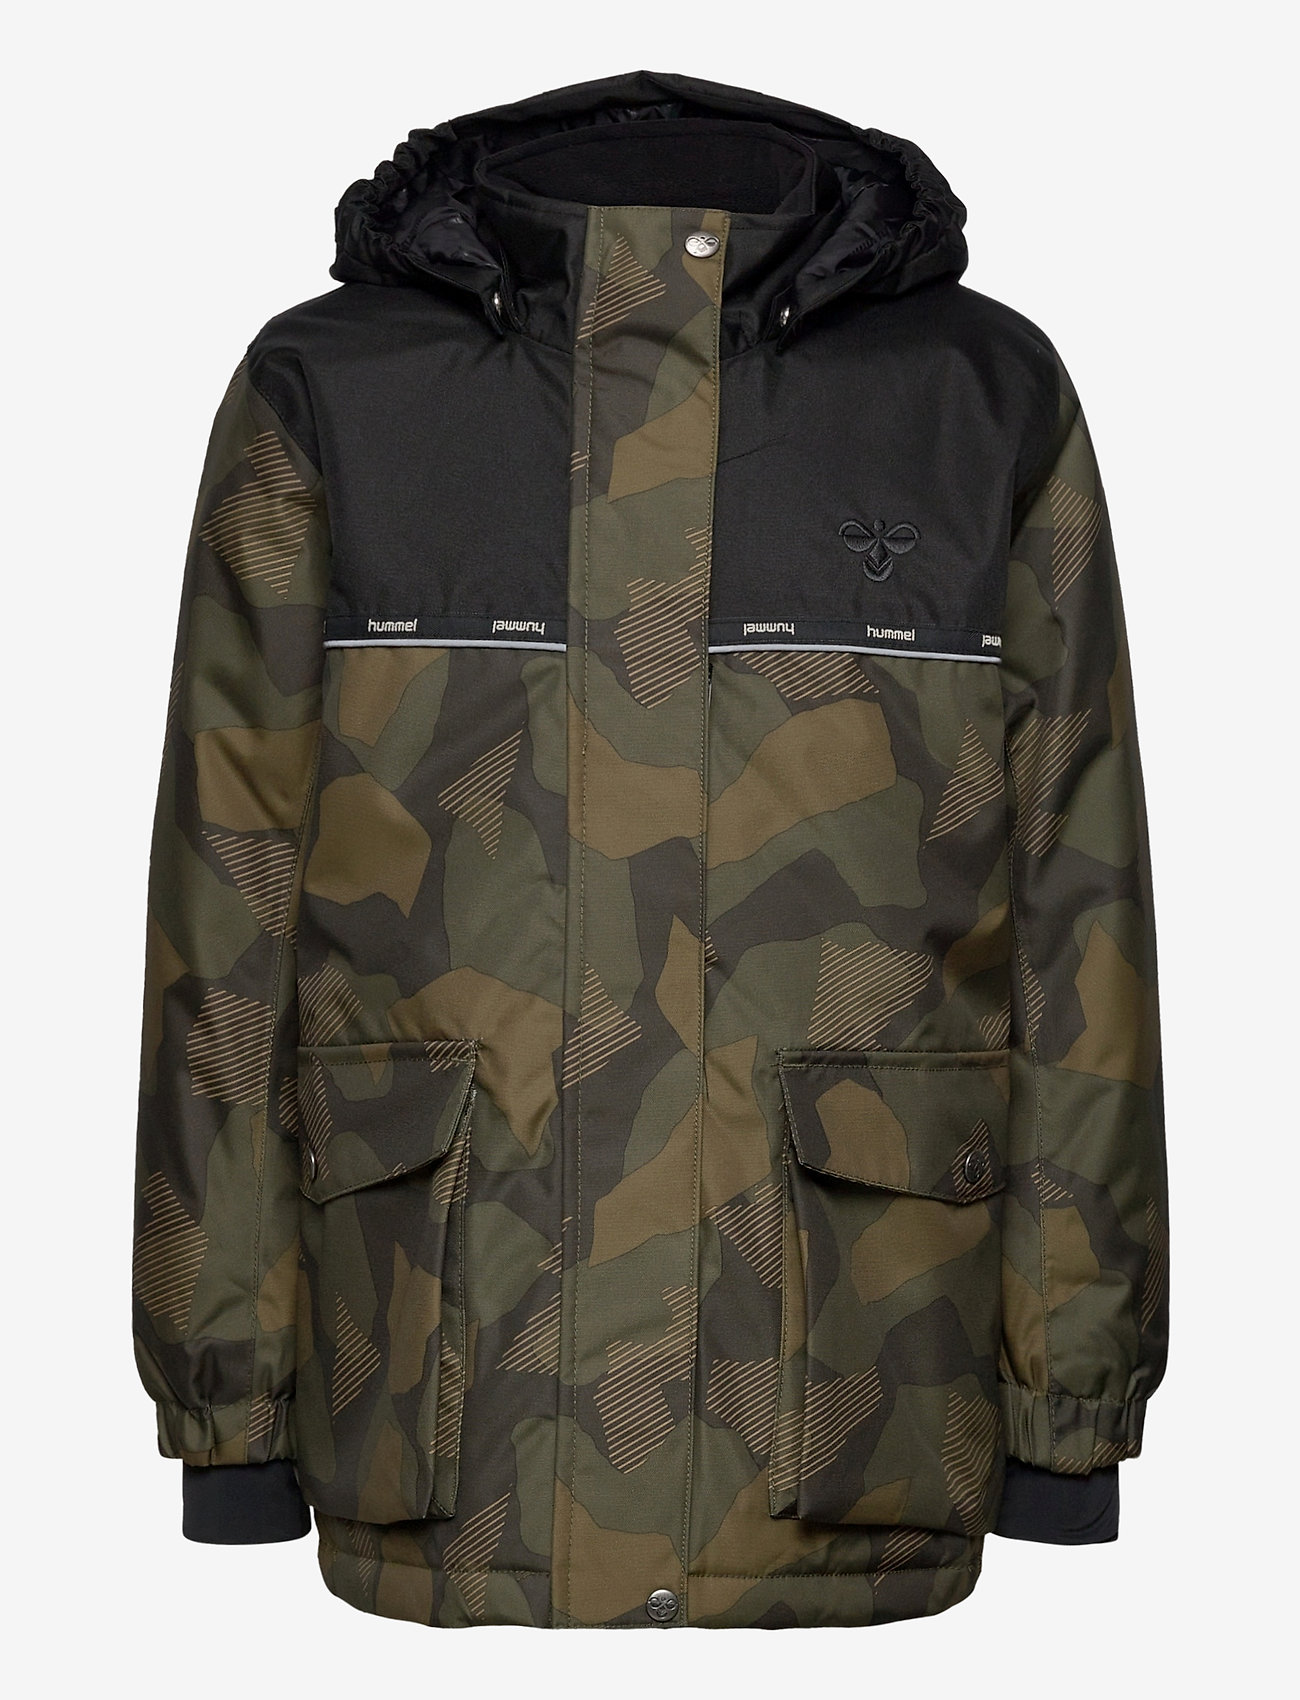 Hummel - hmlWEST JACKET - insulated jackets - olive night/ ecru olive - 1